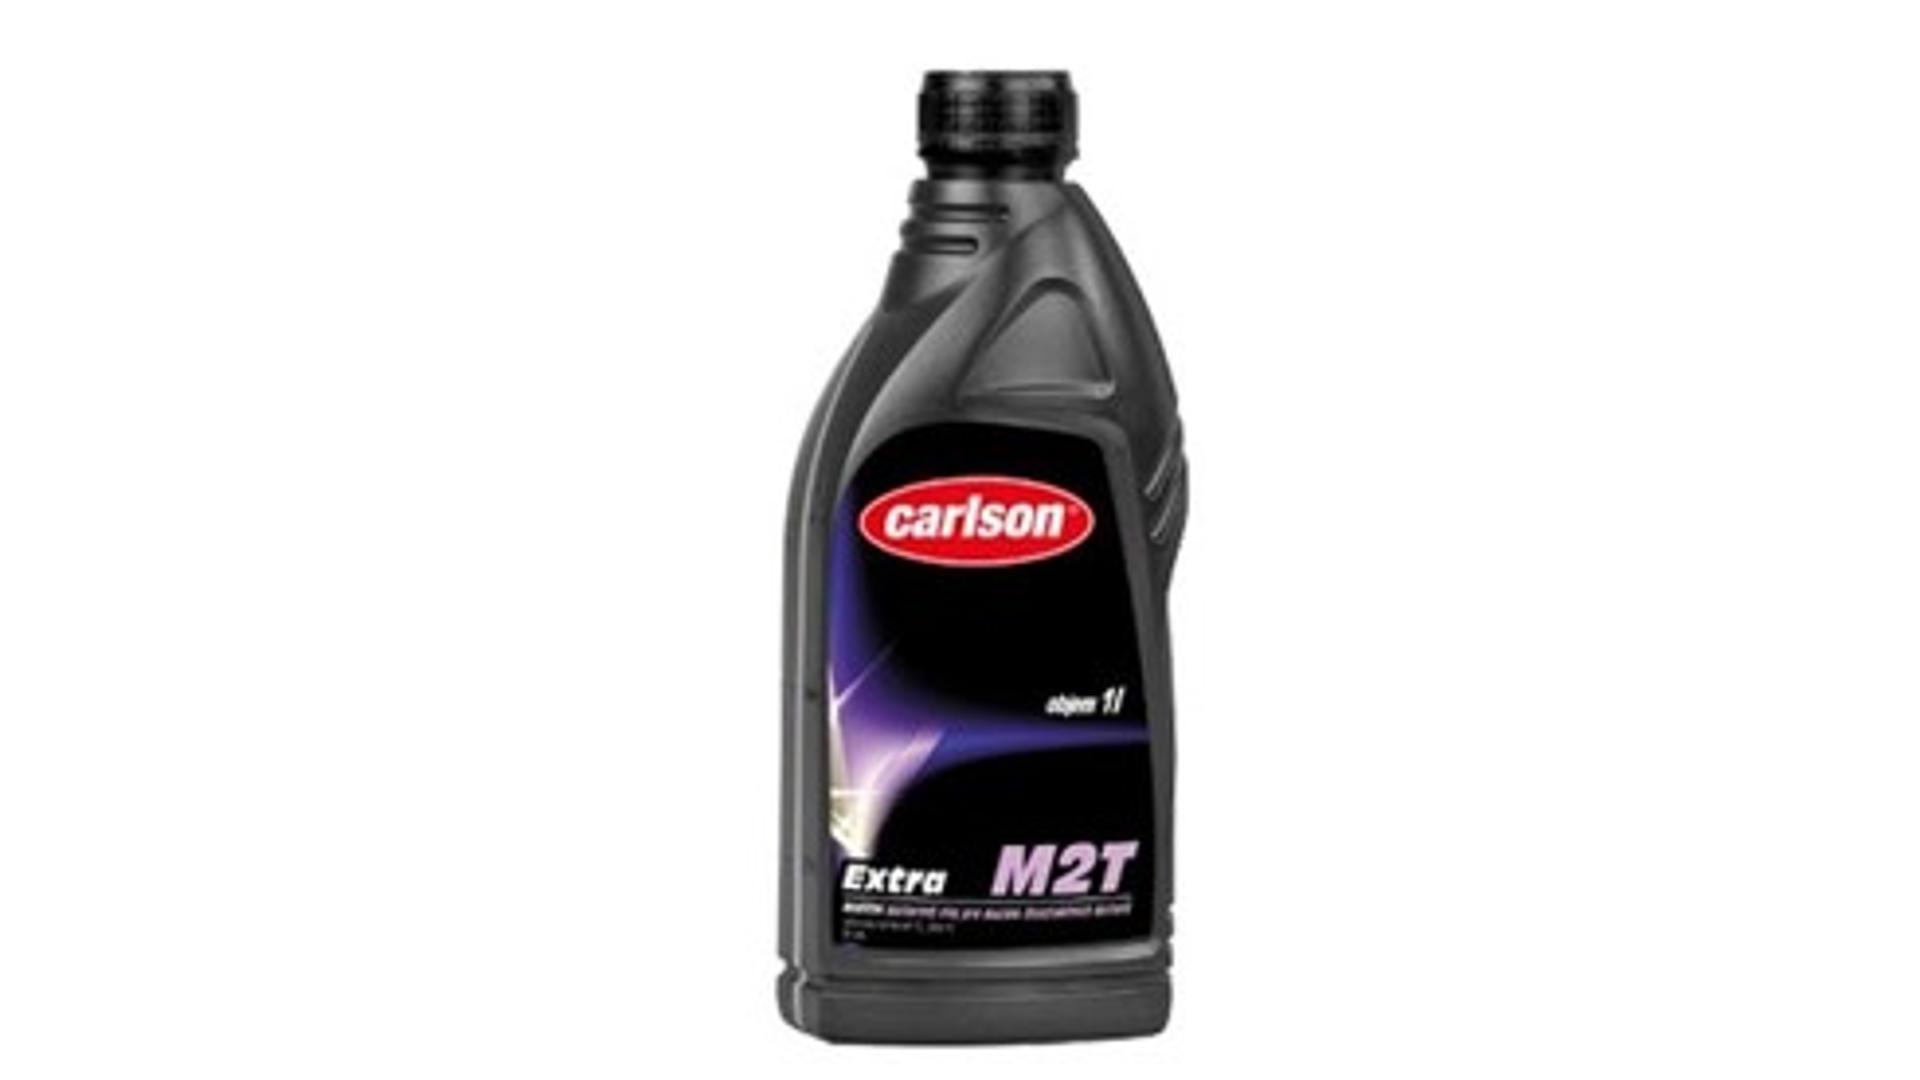 CARLSON EXTRA M2T - 100ML